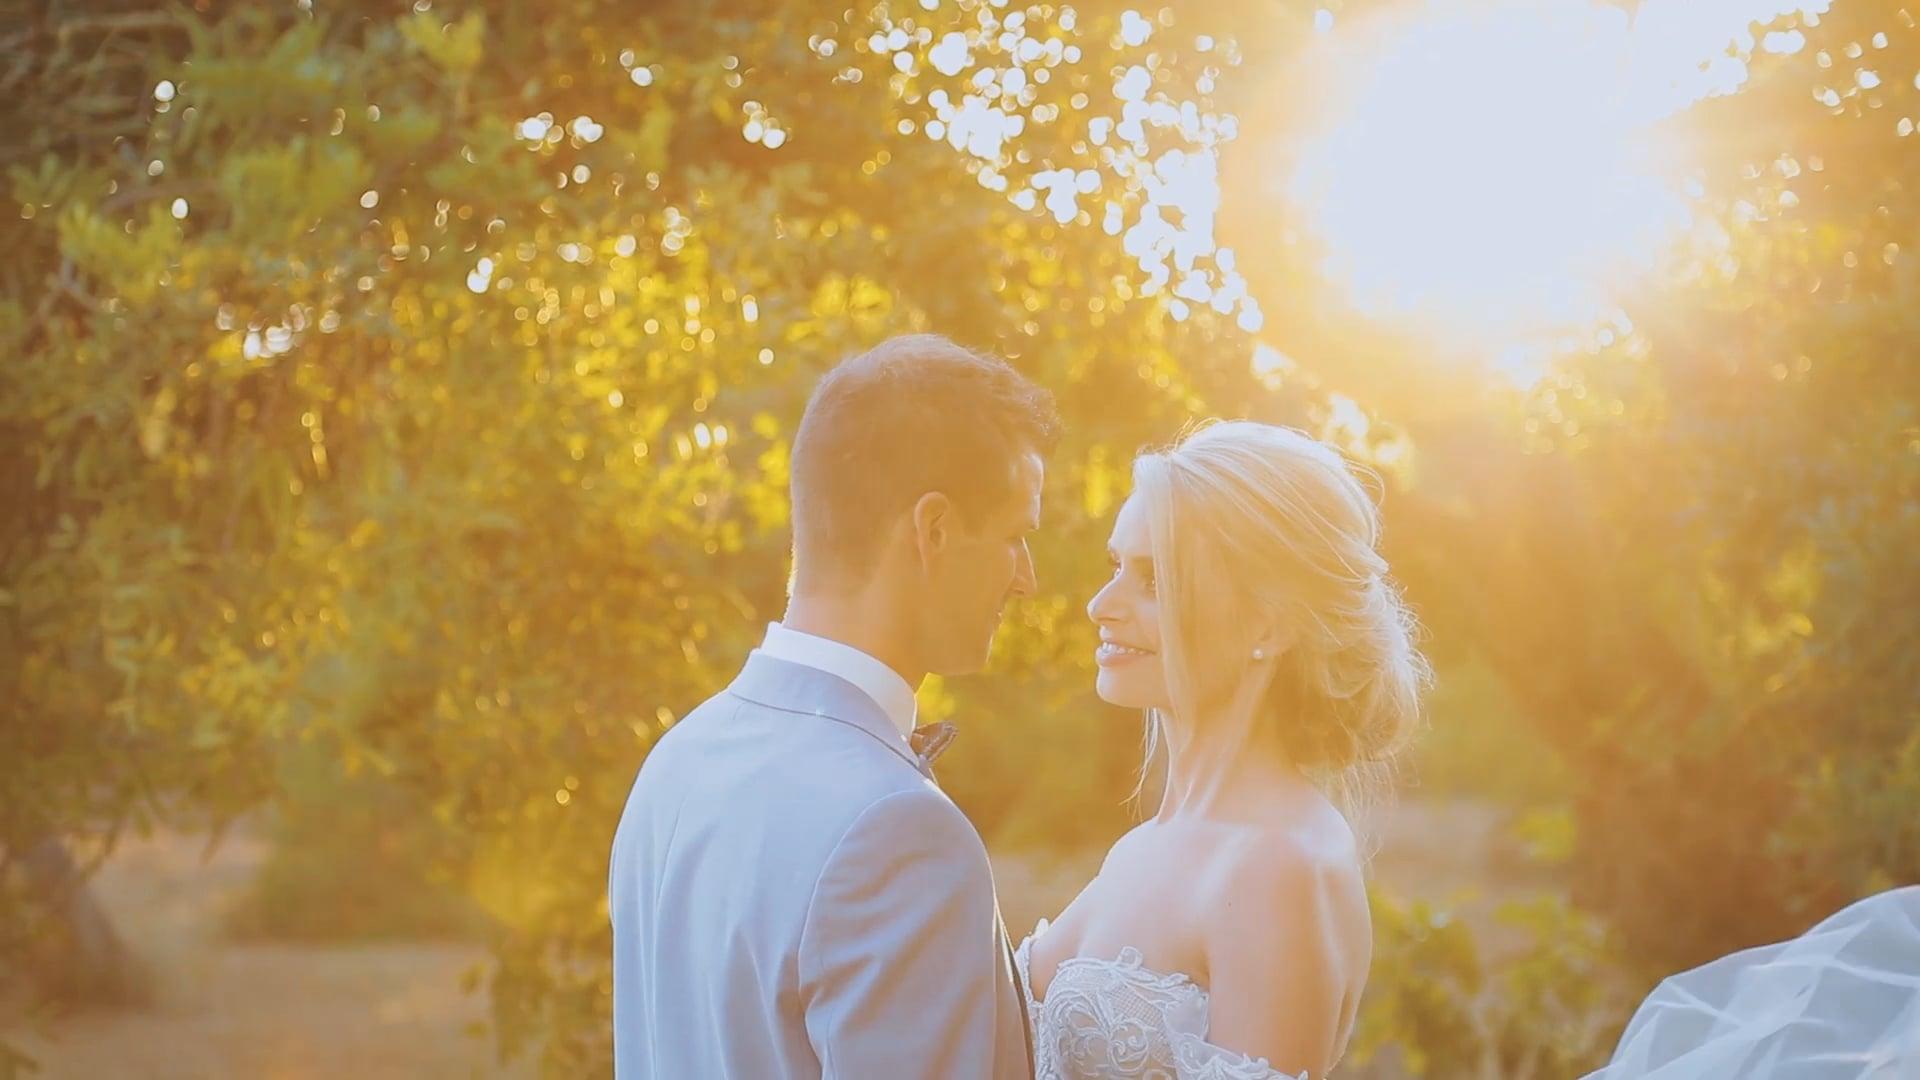 Teaser wedding 2019 _ Romantic Couple